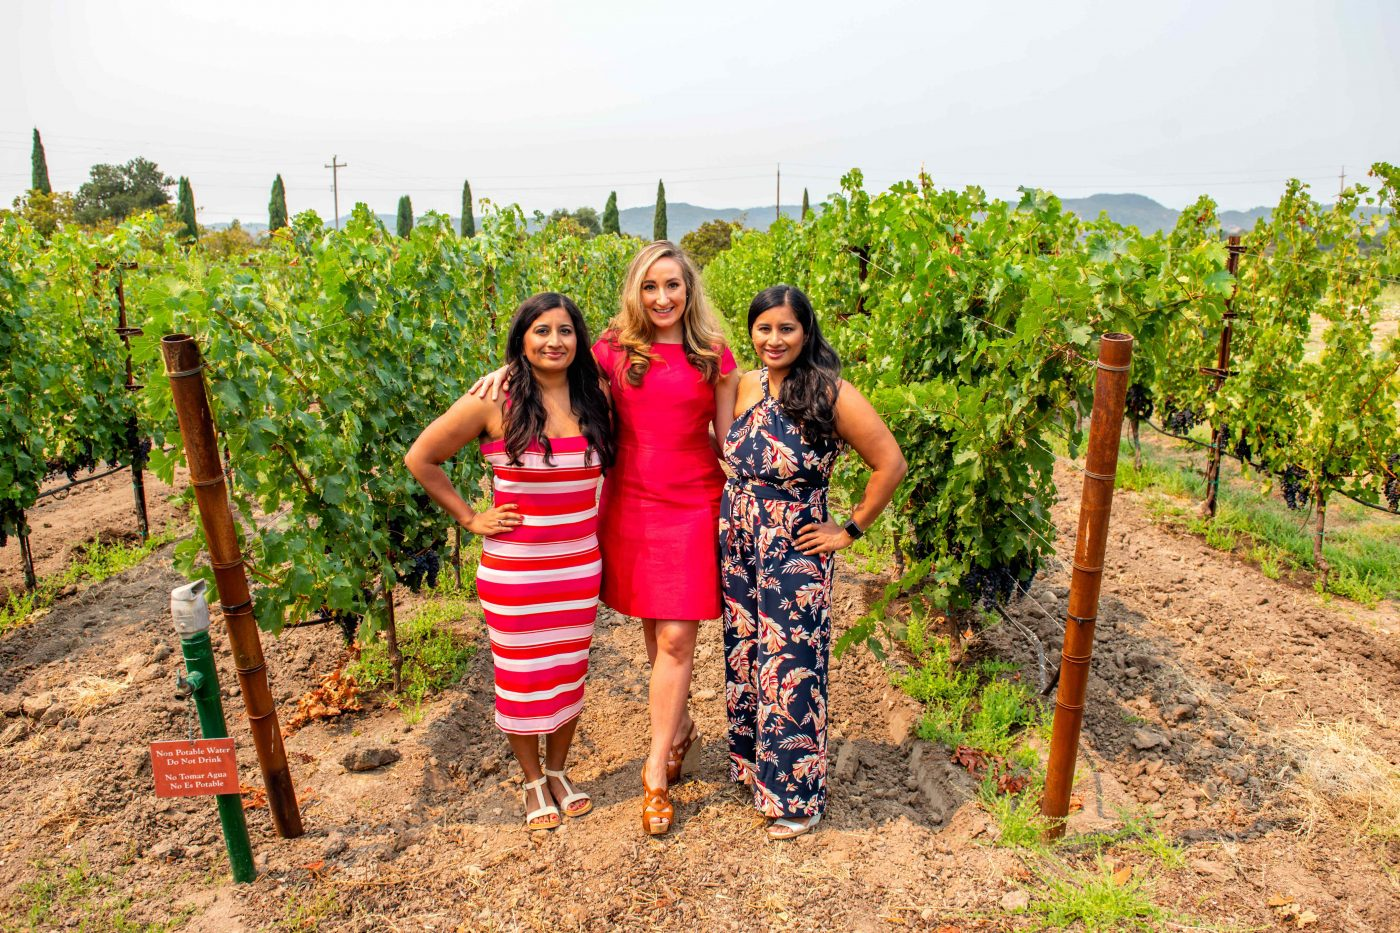 Women at Clos Du Val Vineyard